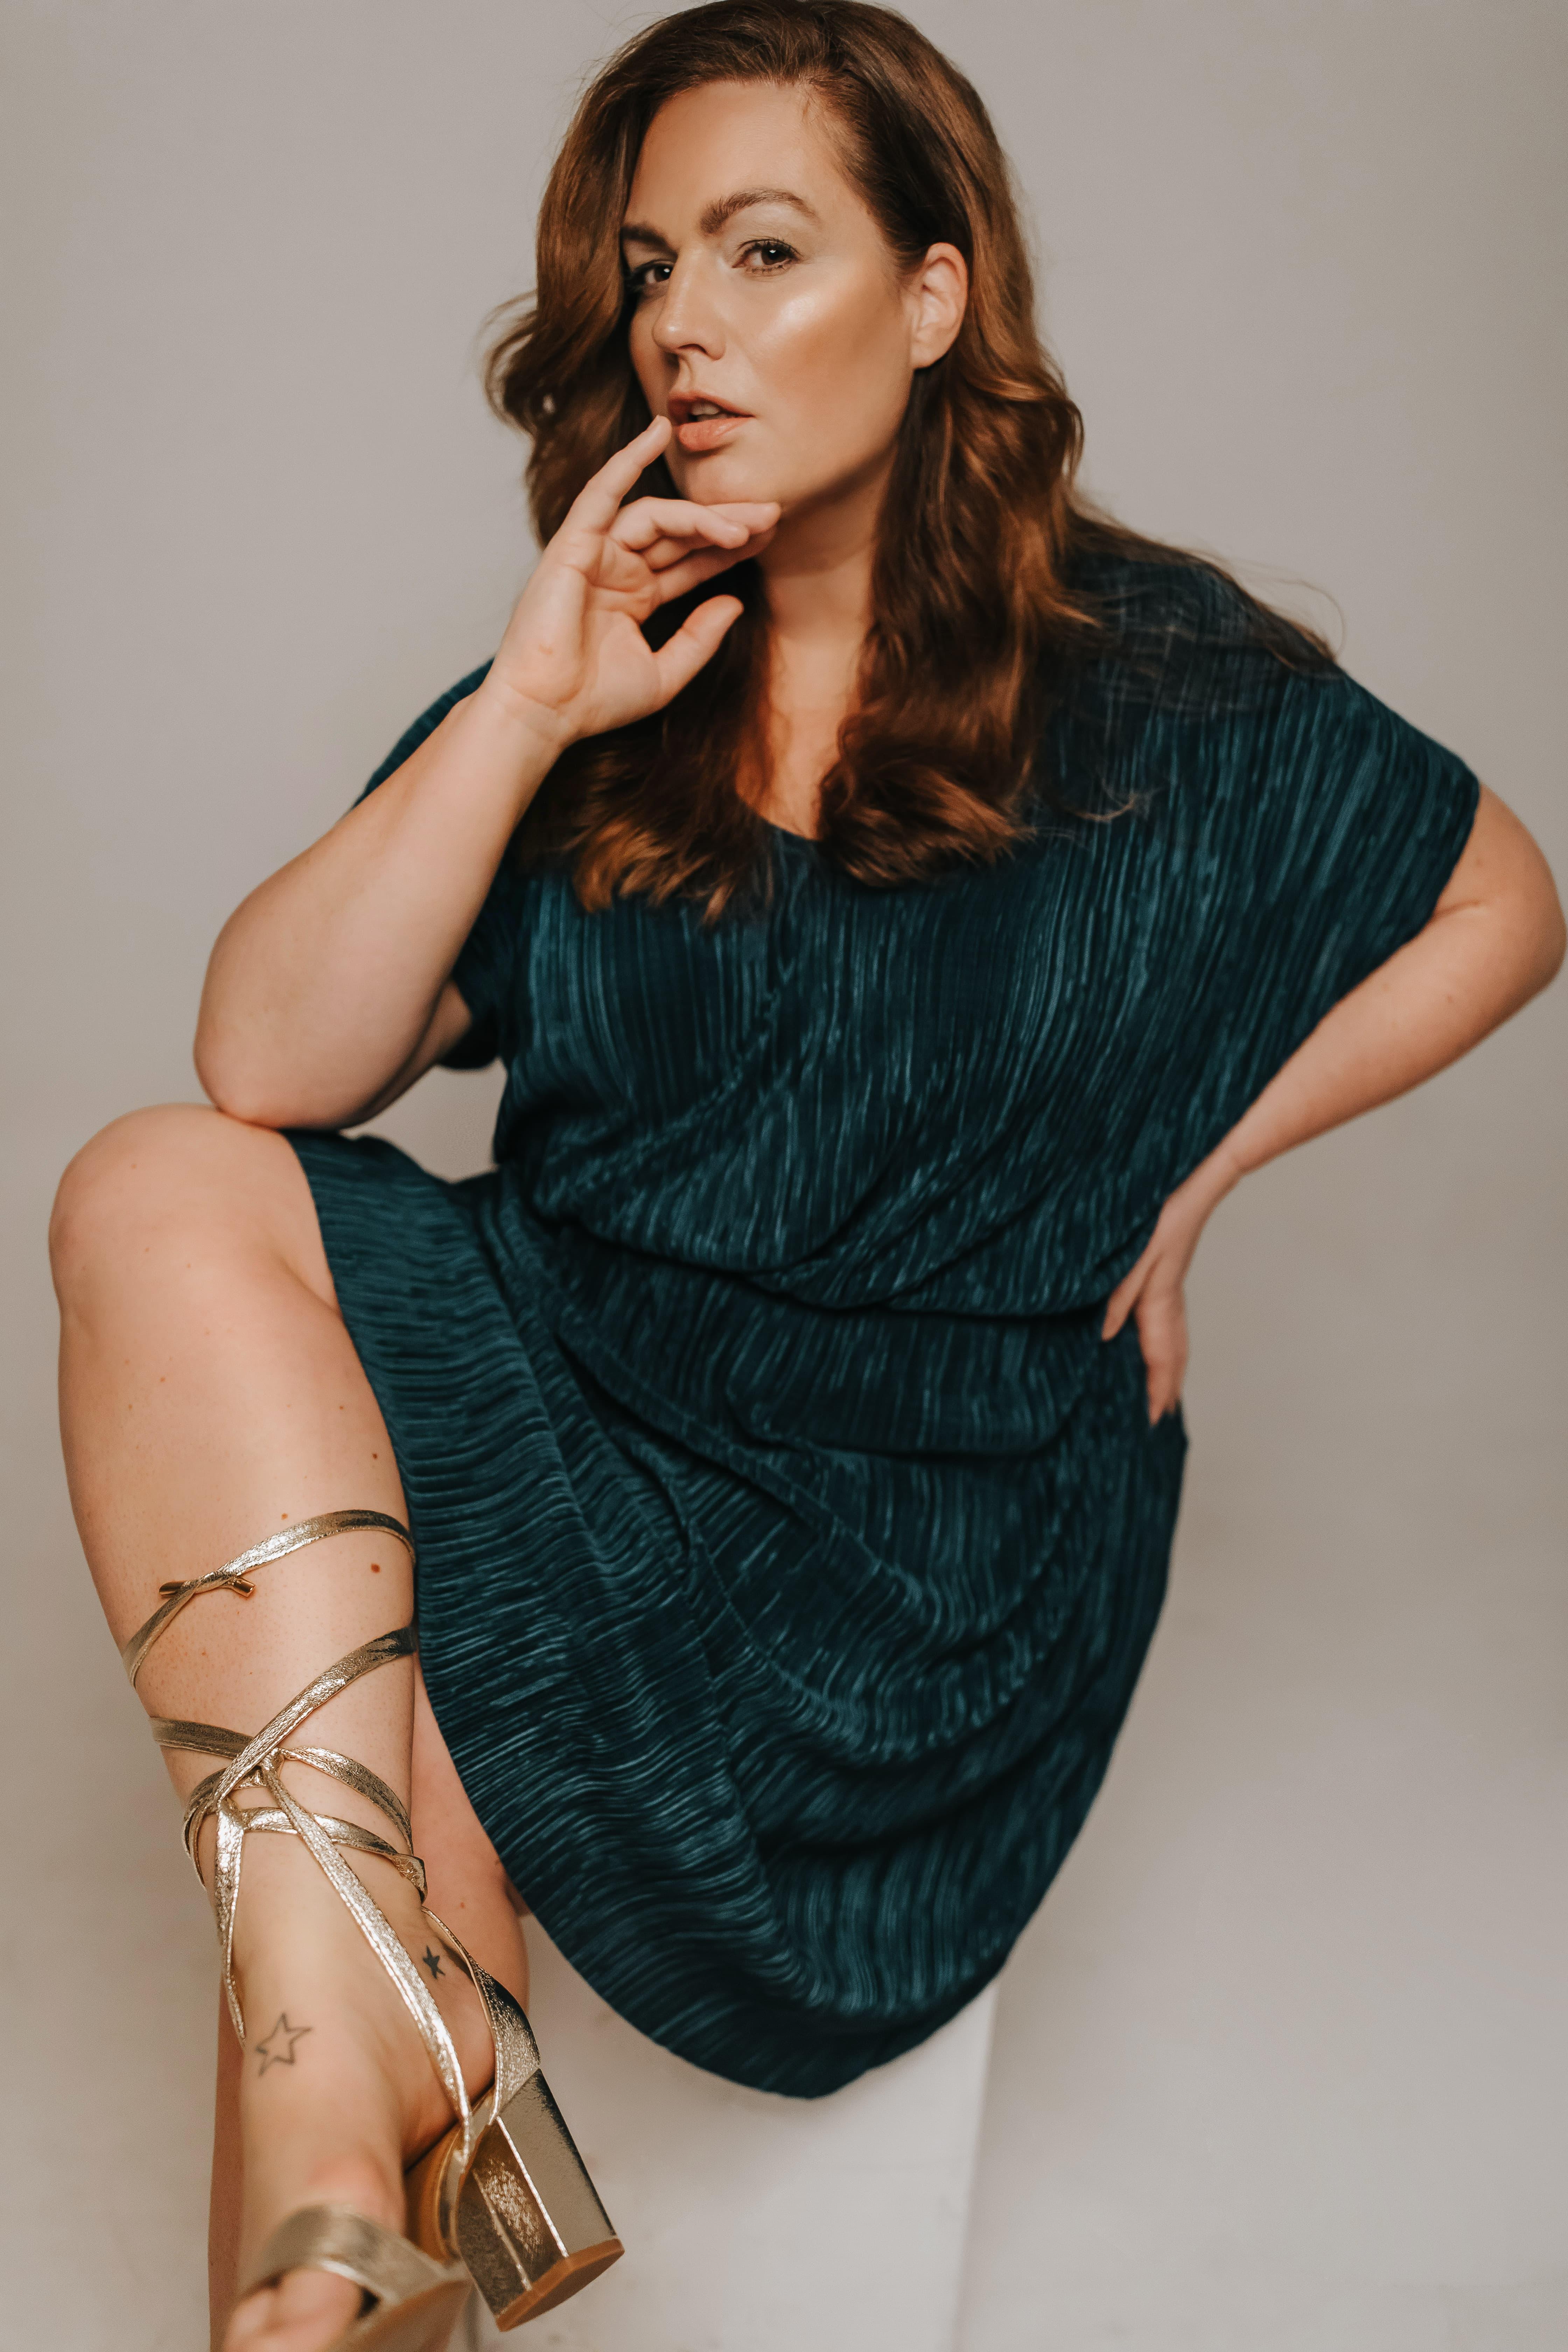 Maren Kissing im Wundercurves Interview